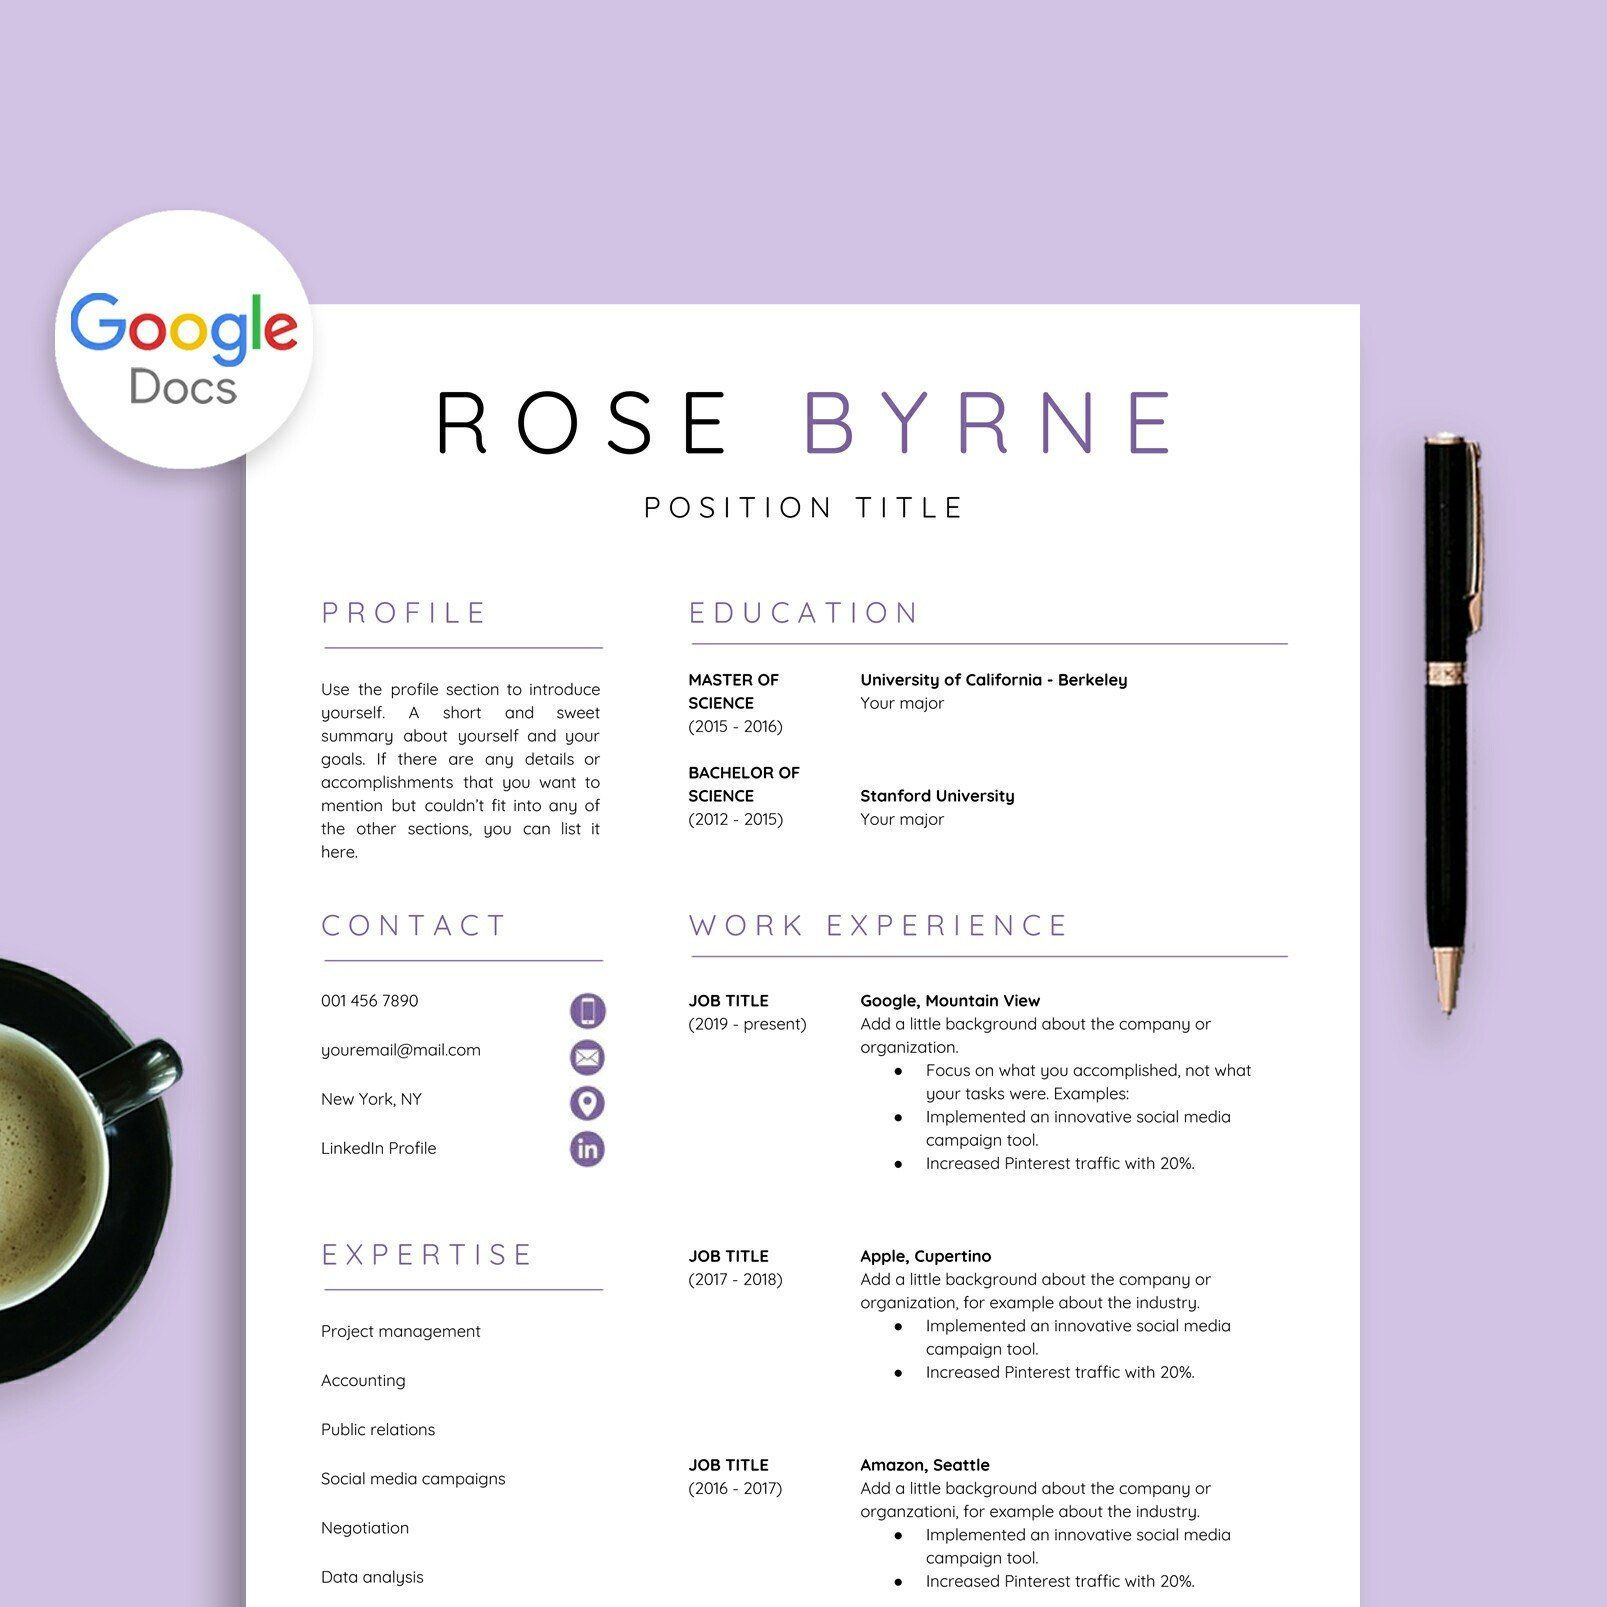 Resume Template Google Docs, Google Docs Resume + Cover